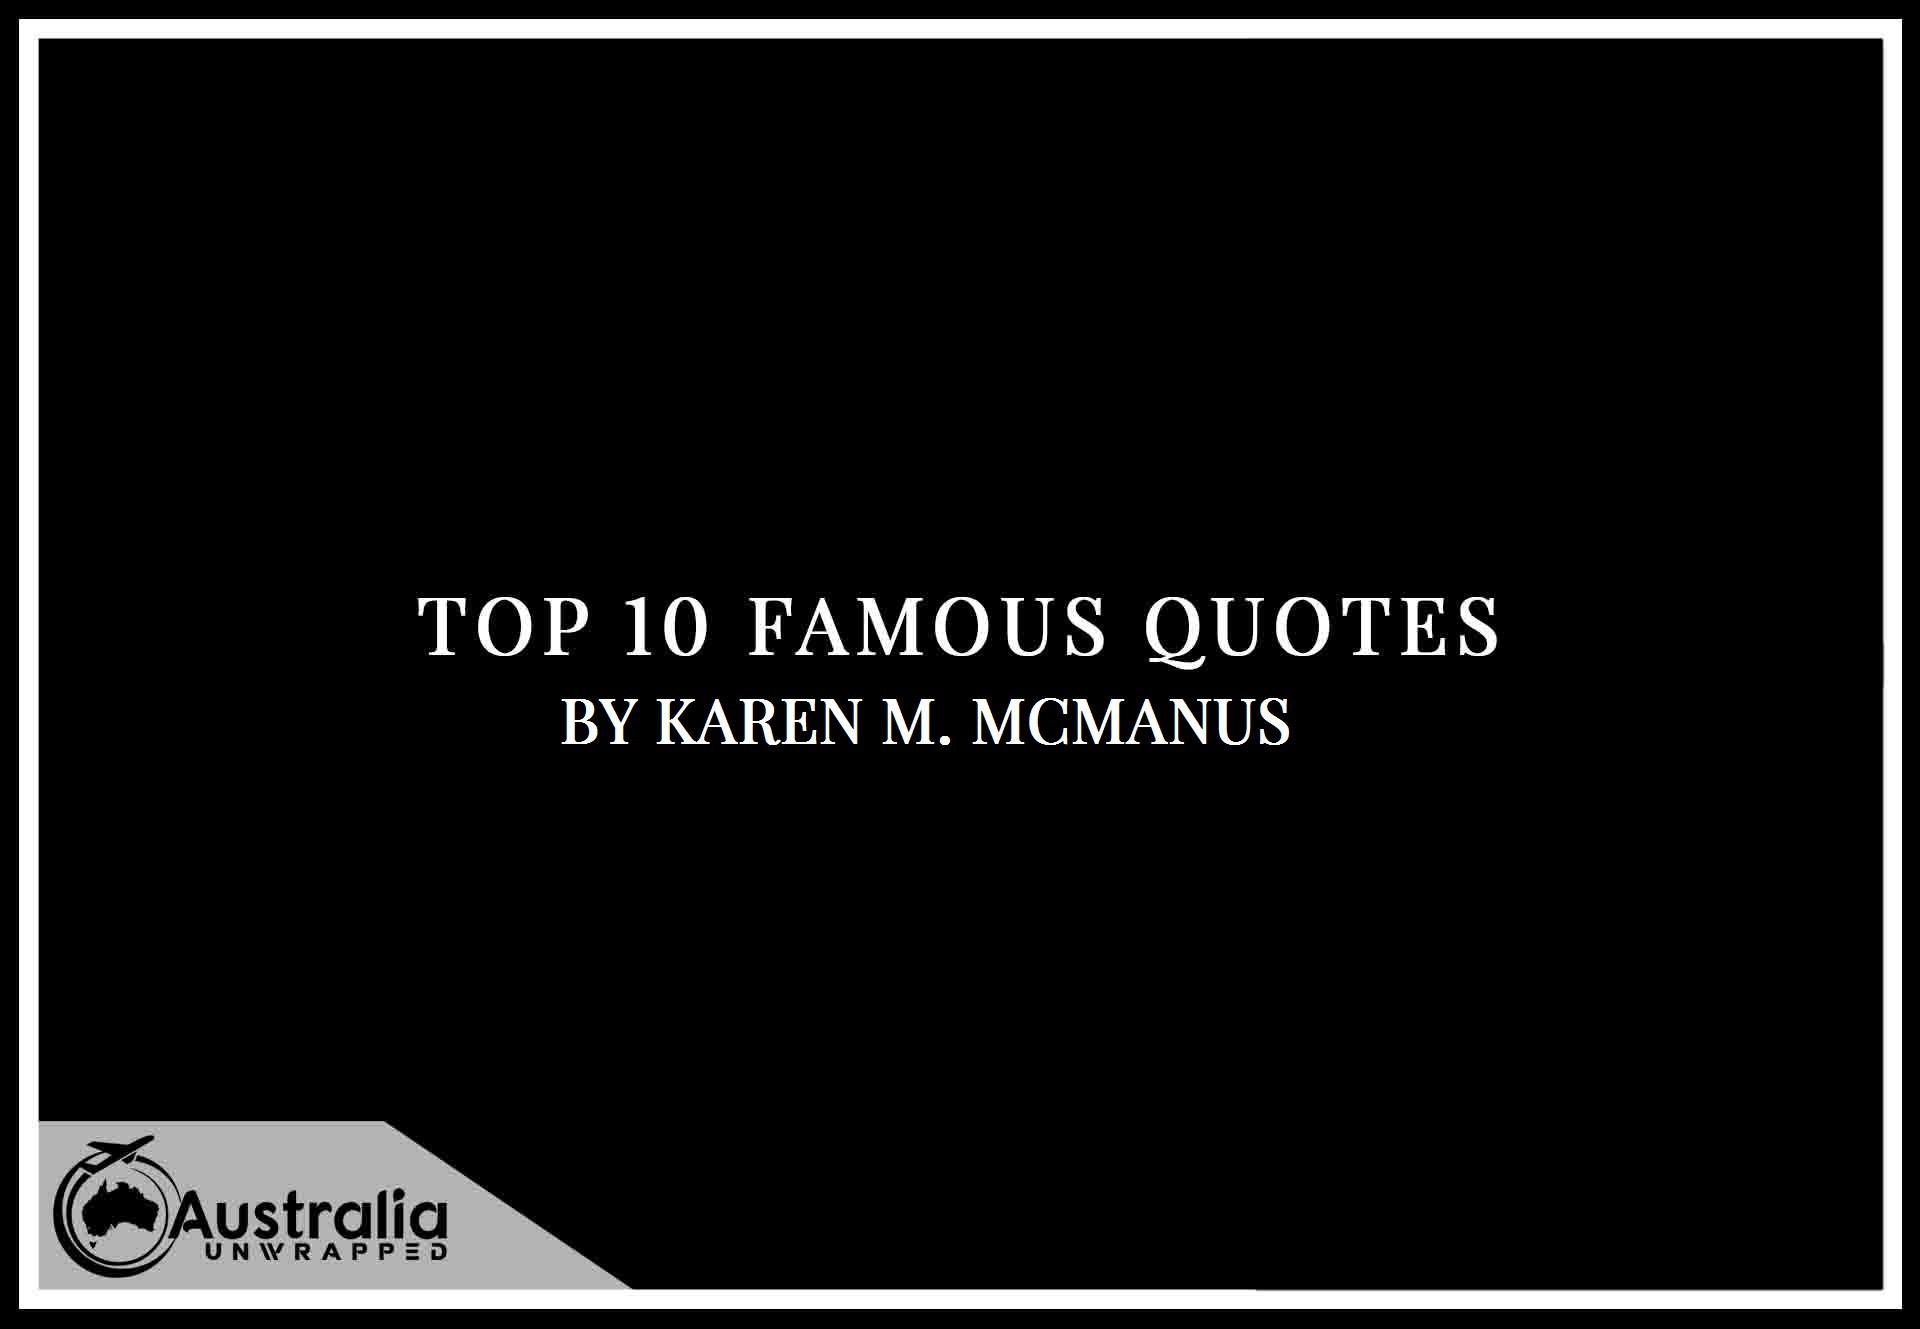 Karen M. McManus's Top 10 Popular and Famous Quotes